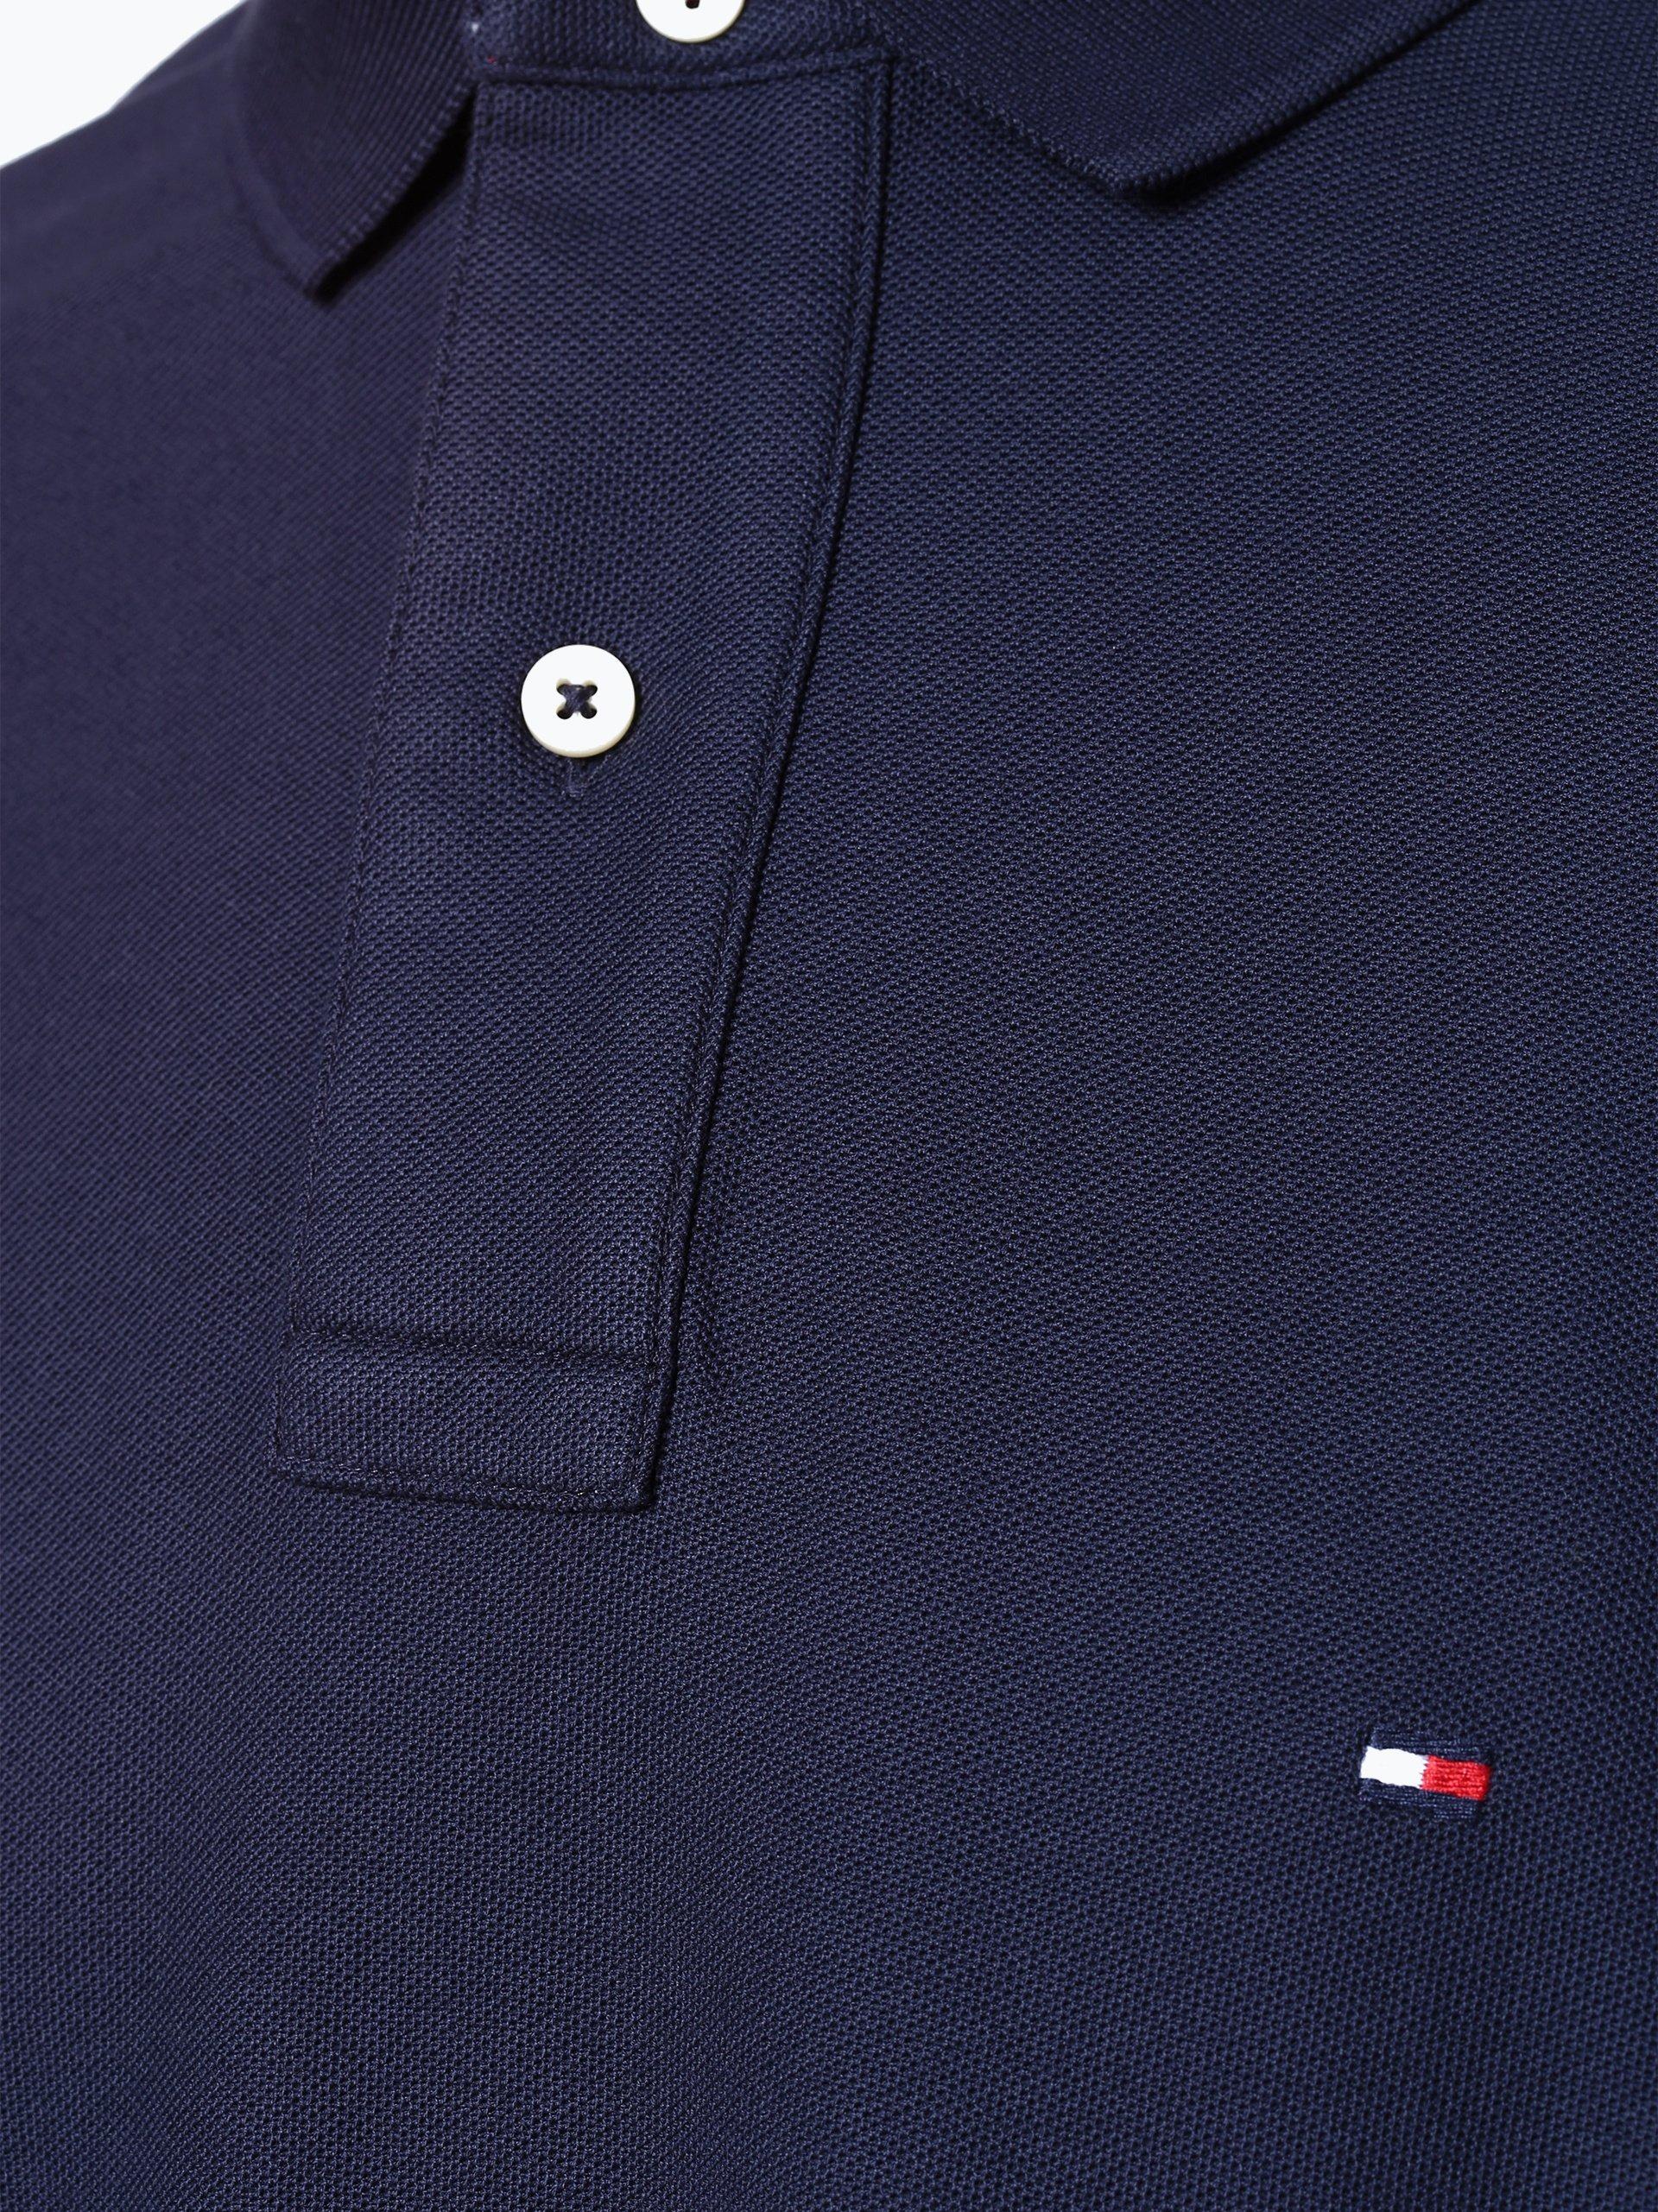 0b4216986 Tommy Hilfiger Męska koszulka polo – Performance kup online ...